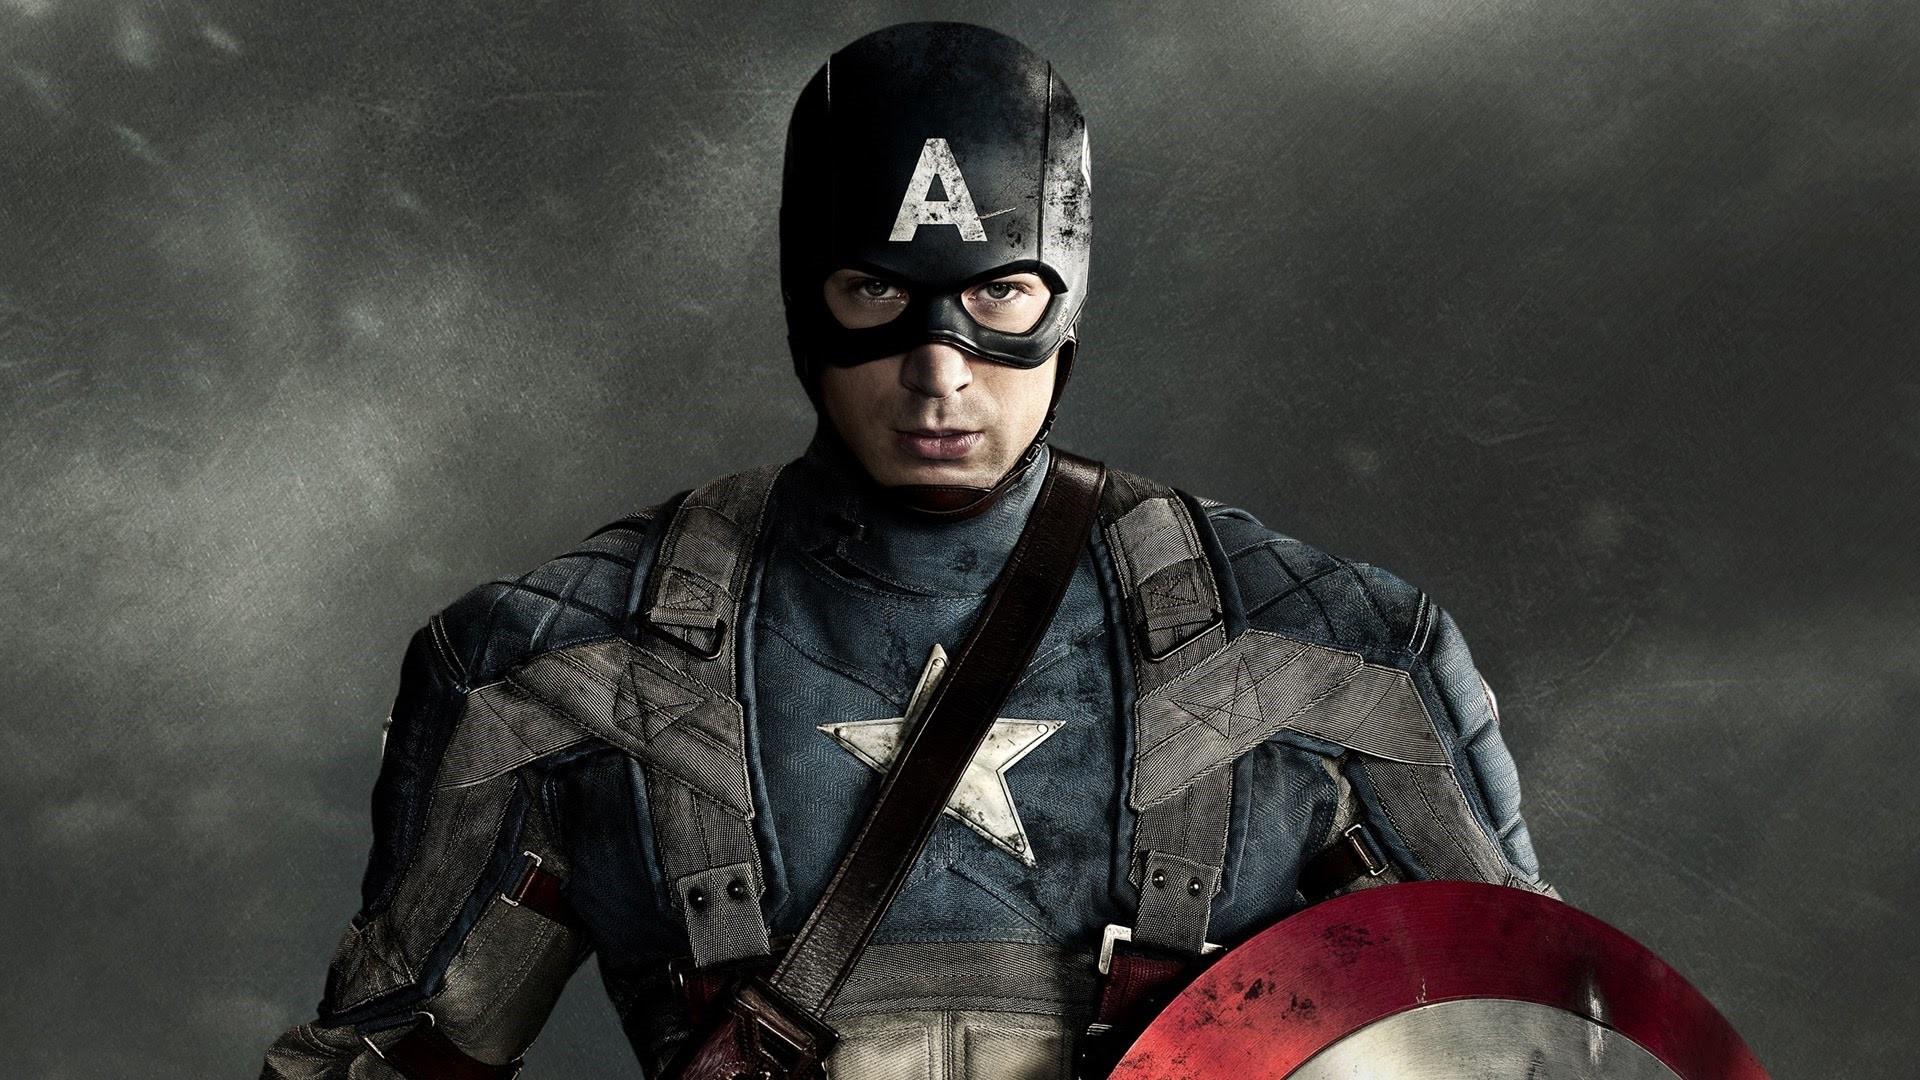 Captain America free download wallpaper